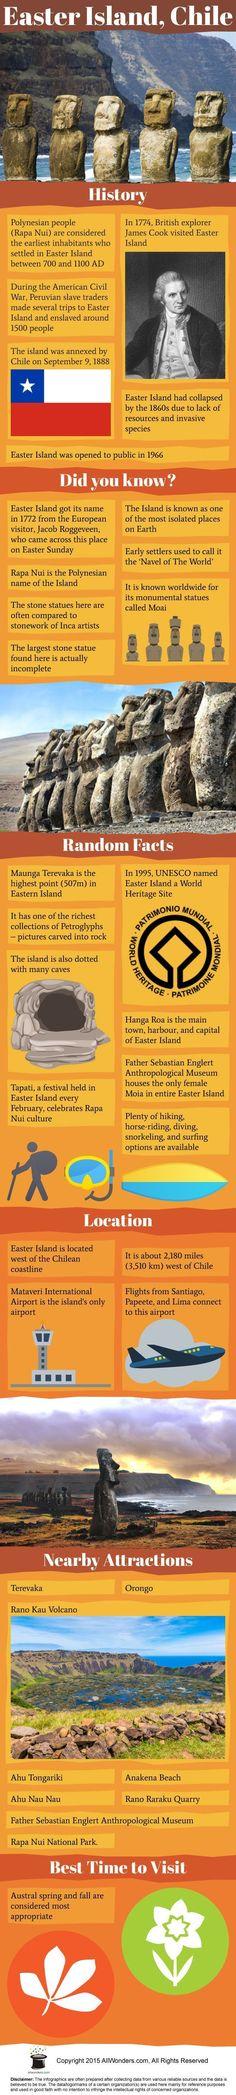 Easter Island Infographic                                                       … #travelinfographic #SouthAmericaTravelChile